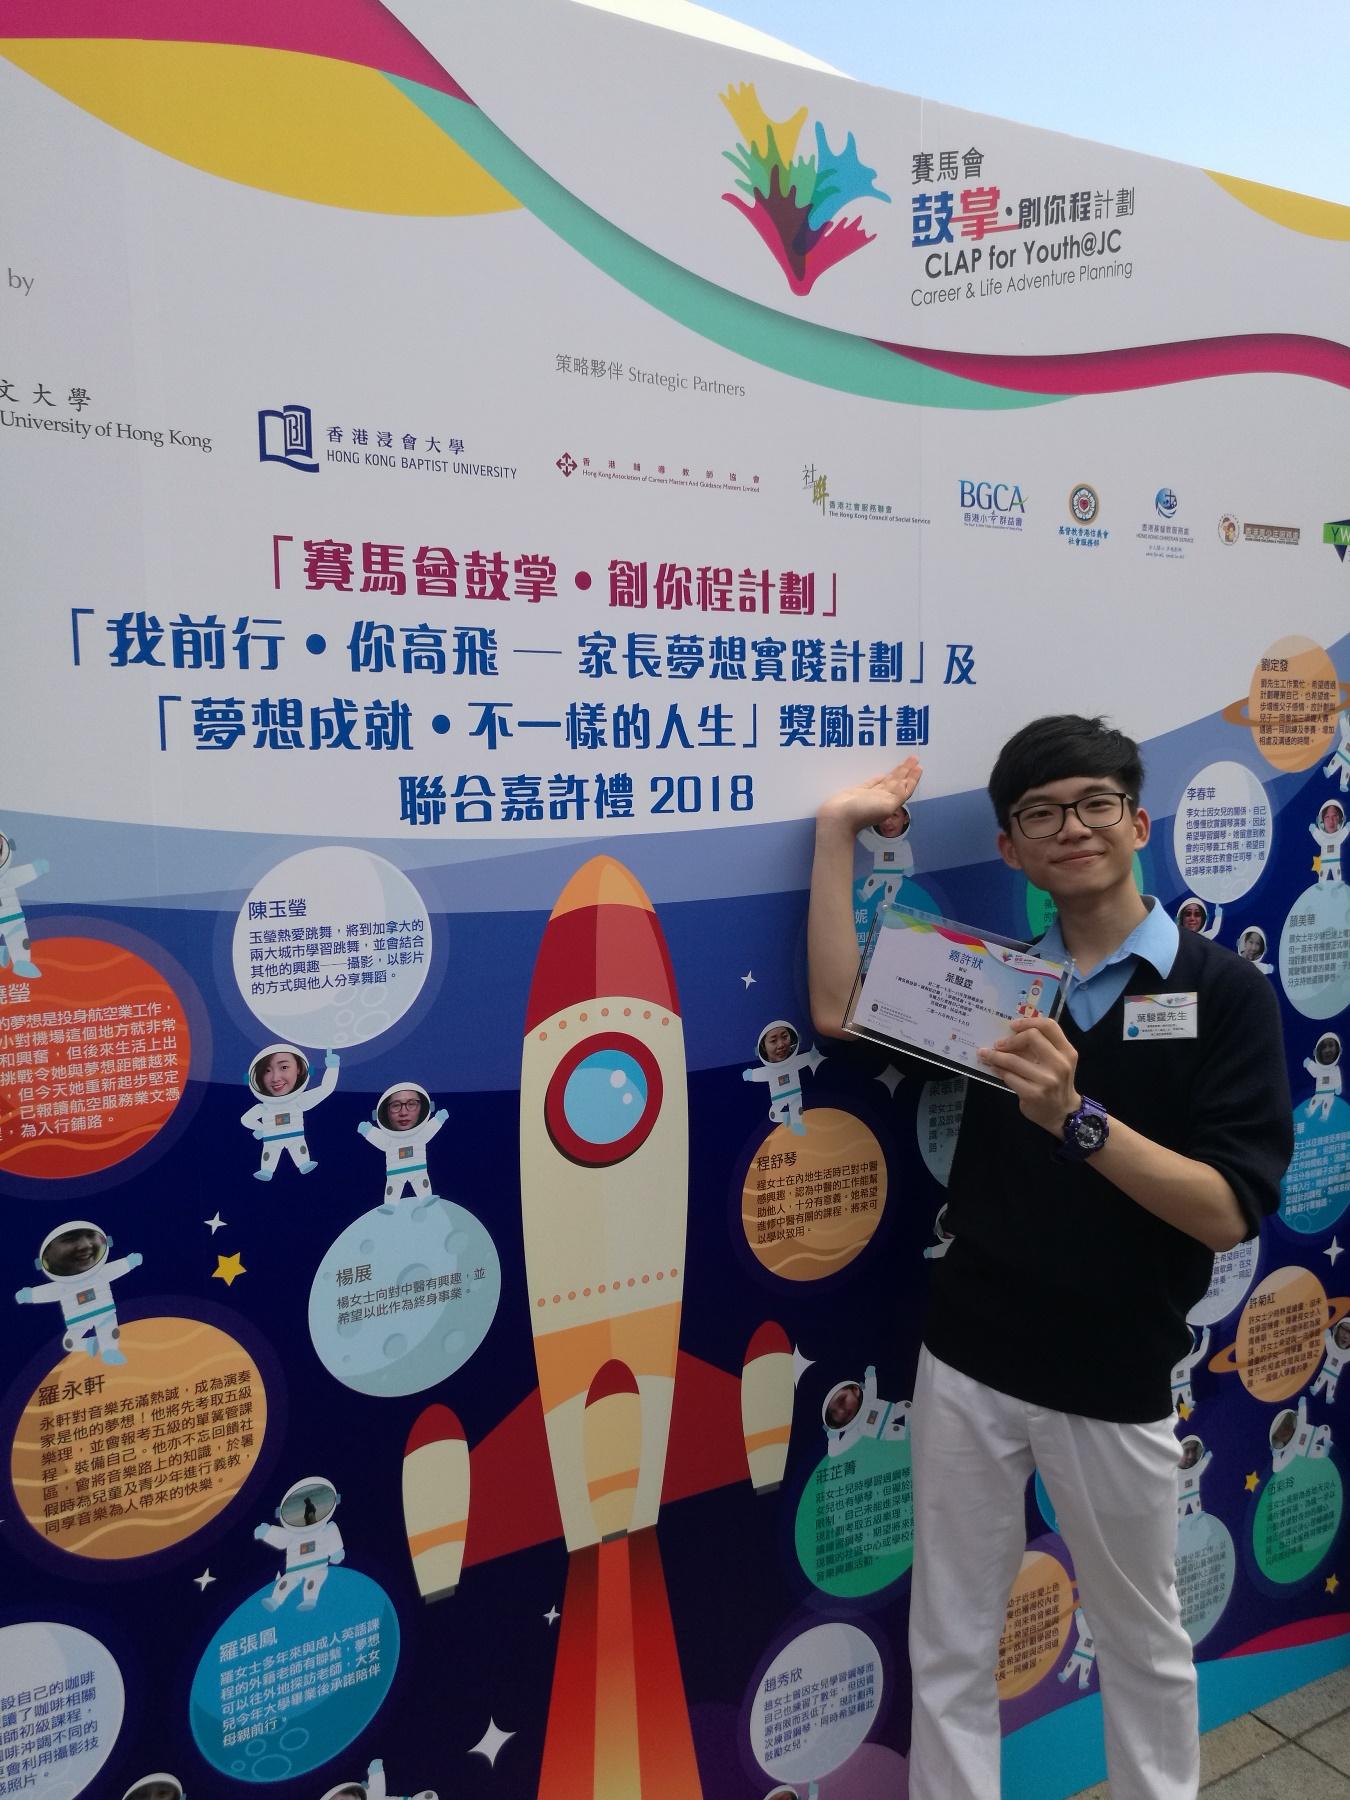 https://www.npc.edu.hk/sites/default/files/img_20180429_170123.jpg